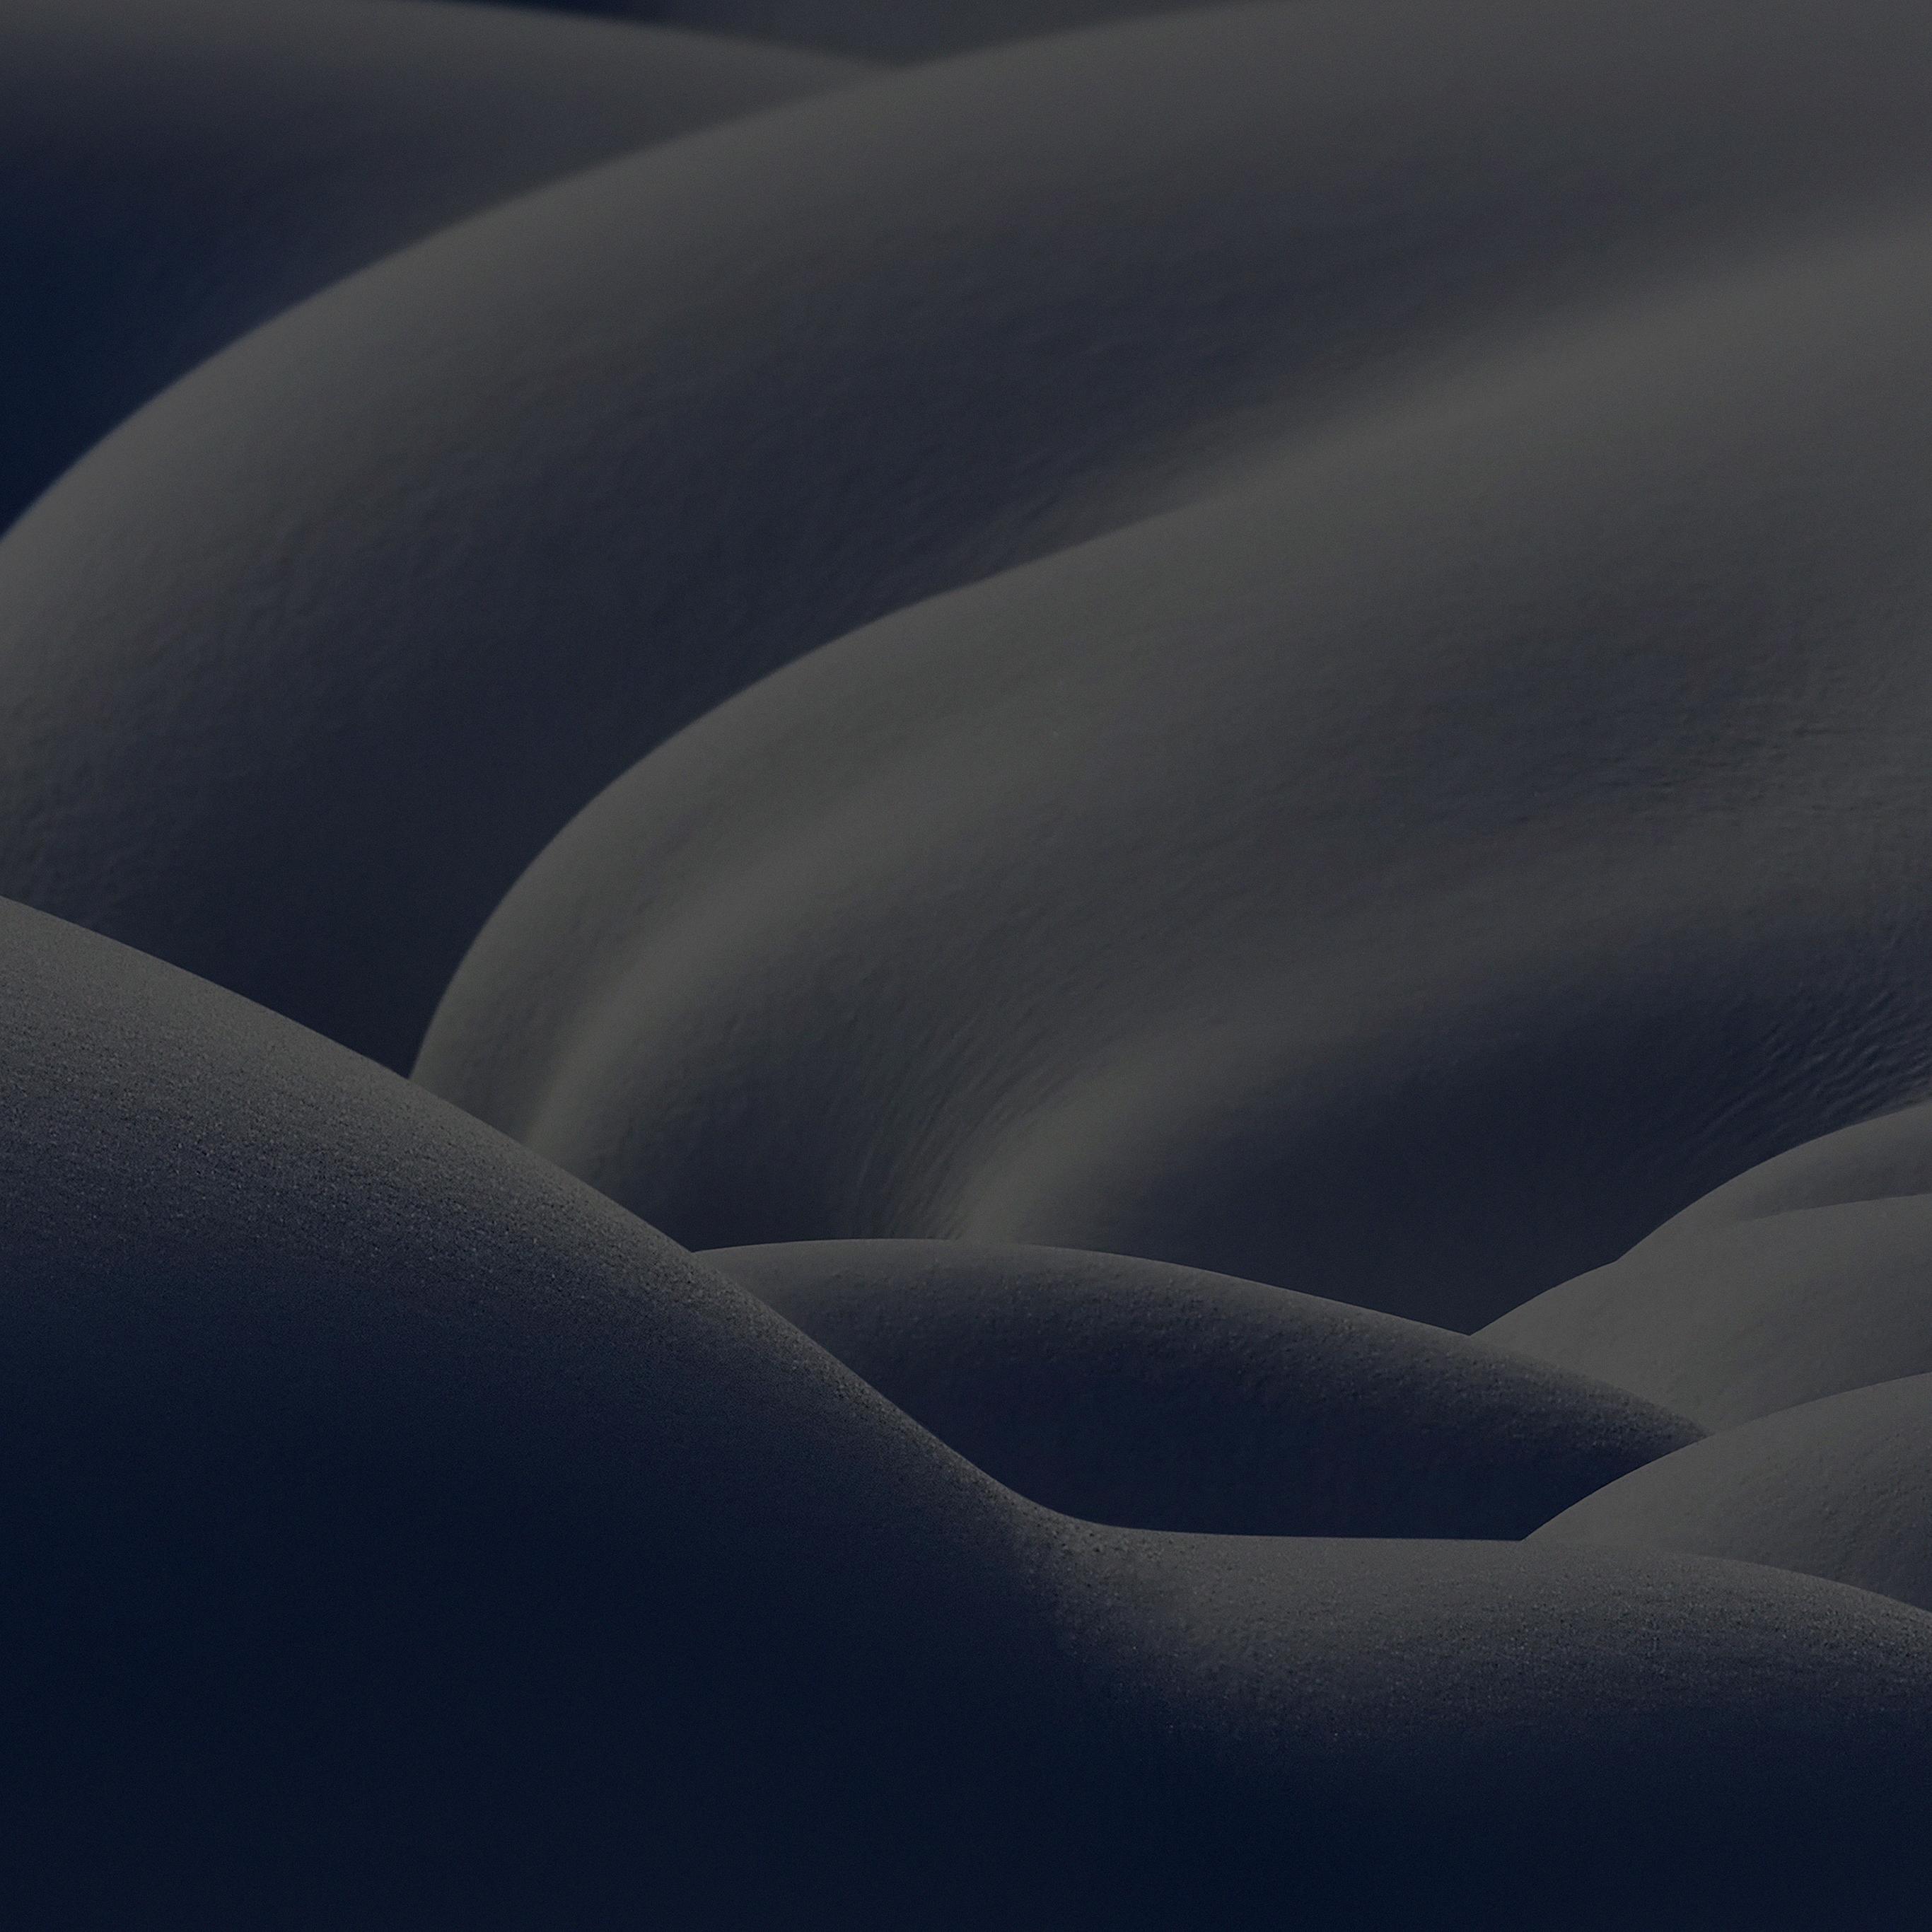 mi20-snow-mountain-winter-coming-cold-dark-sad-wallpaper